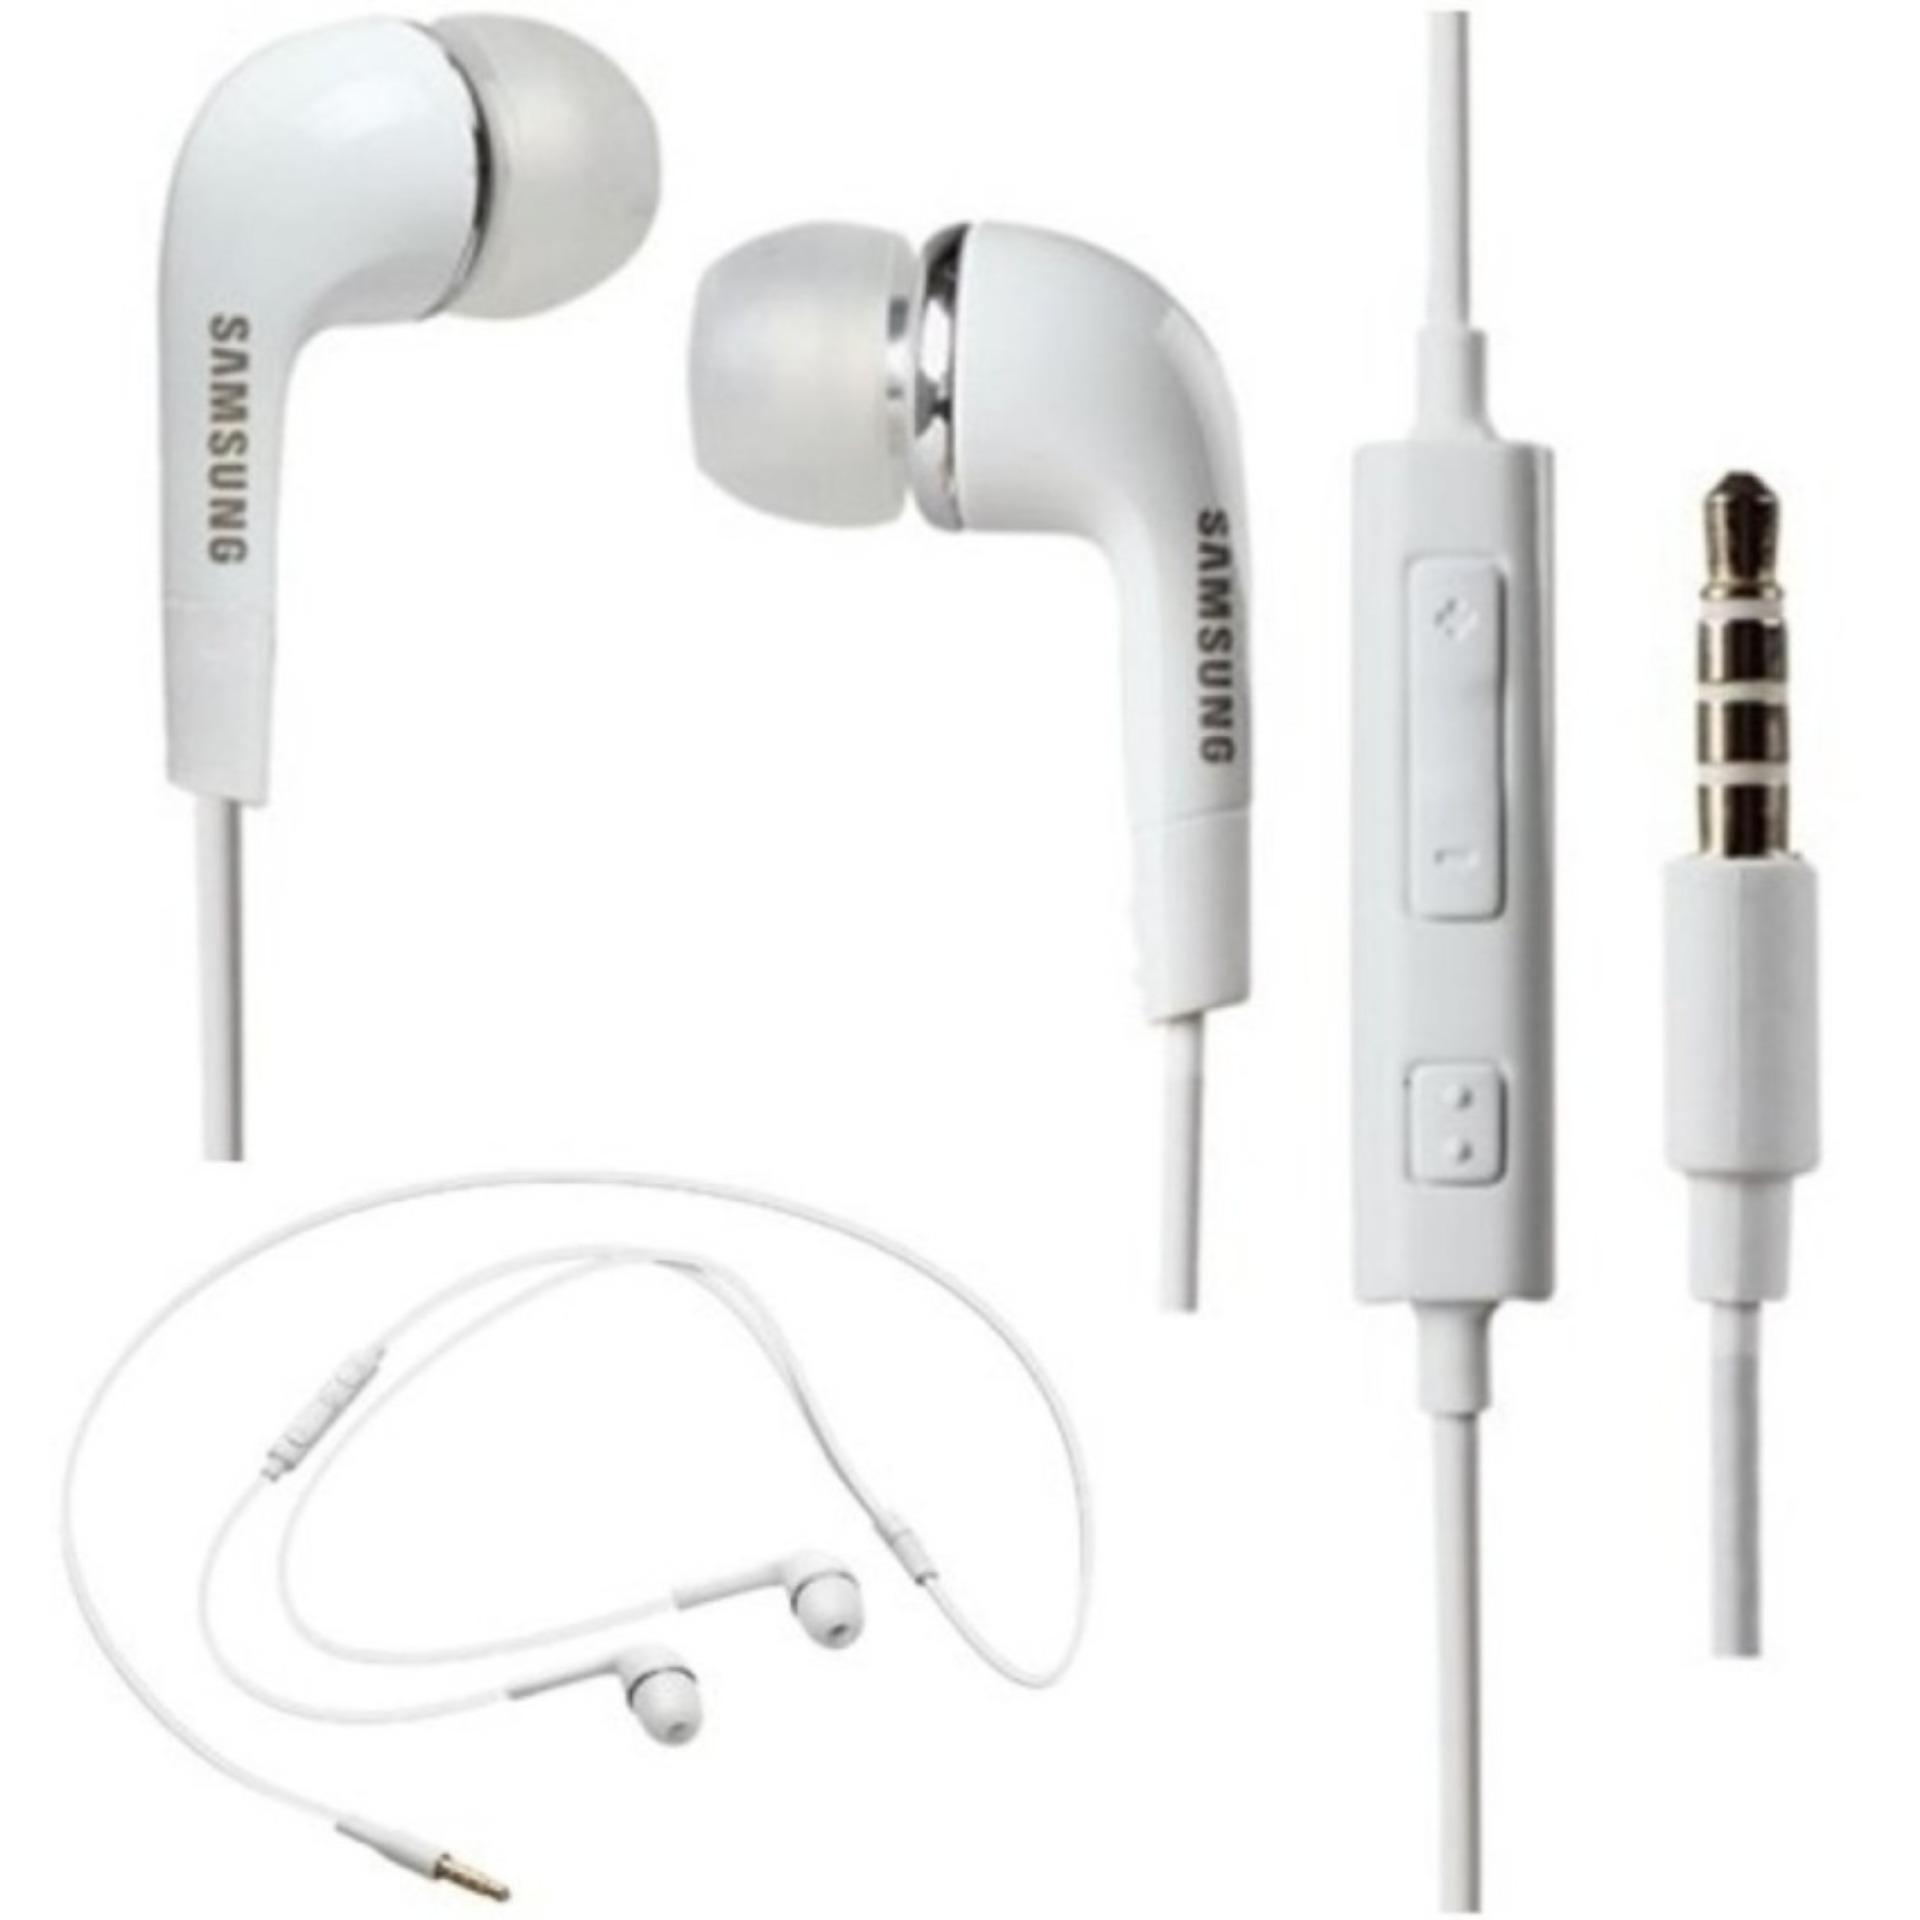 Eshop Checker Samsung Earphone Headset Handsfree Stereo S4 Putih I9220 With Control Talk